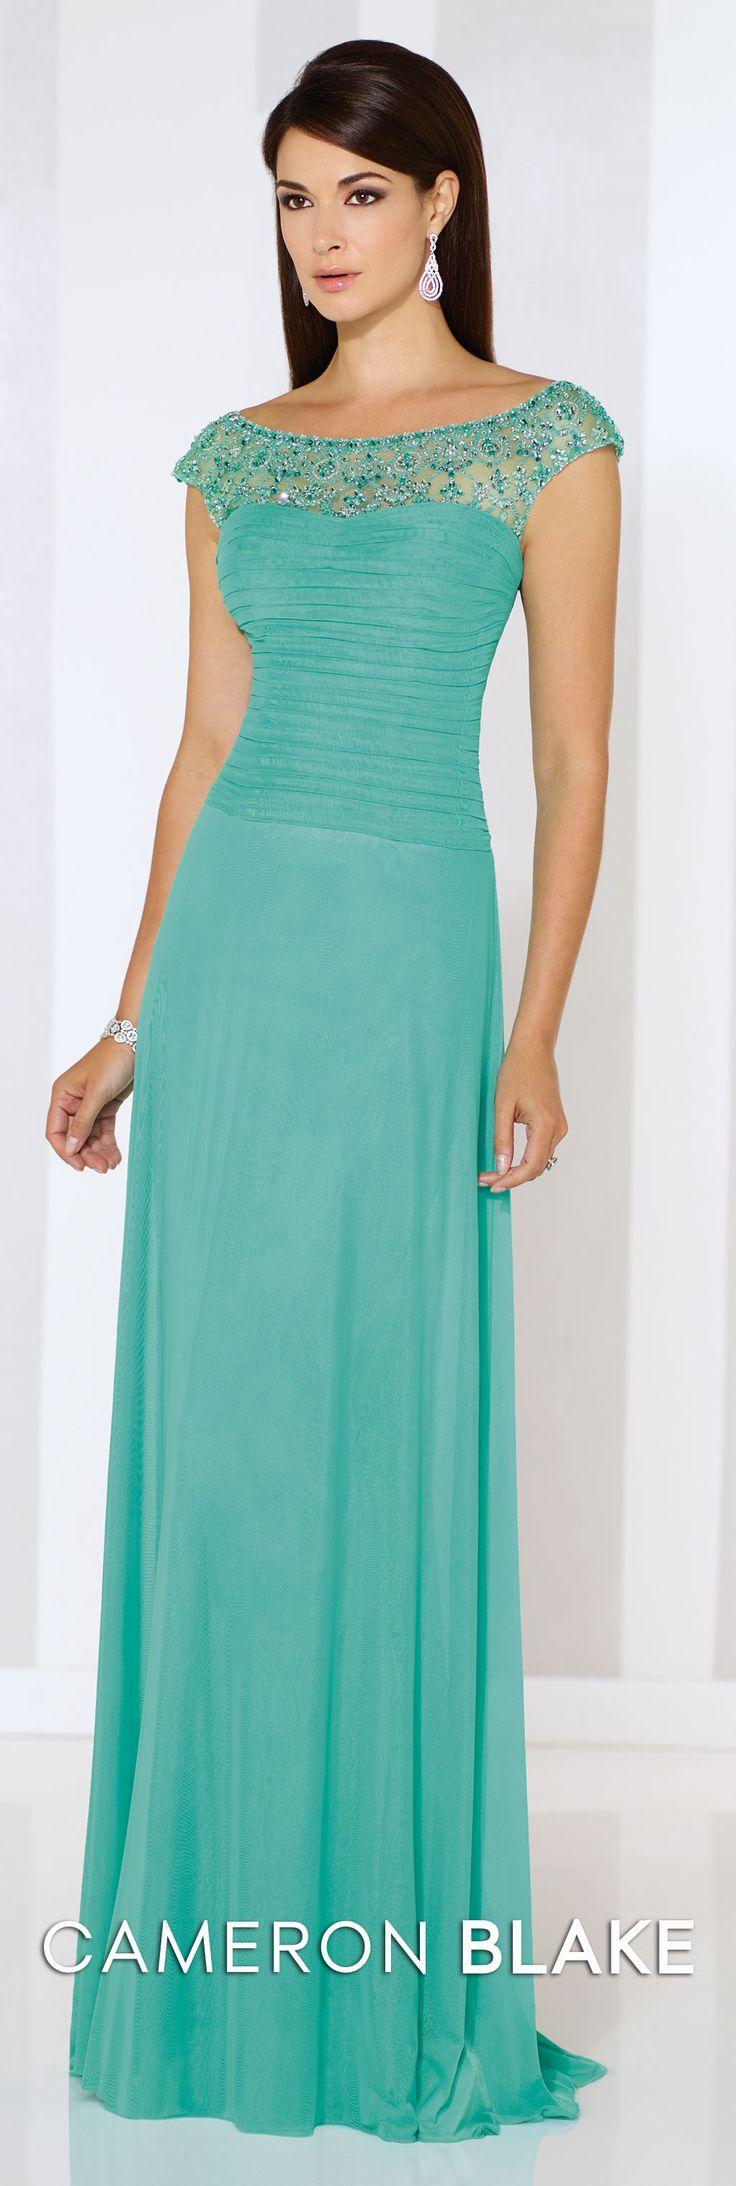 1007 best dresses images on Pinterest | Clothing apparel, Dress lace ...